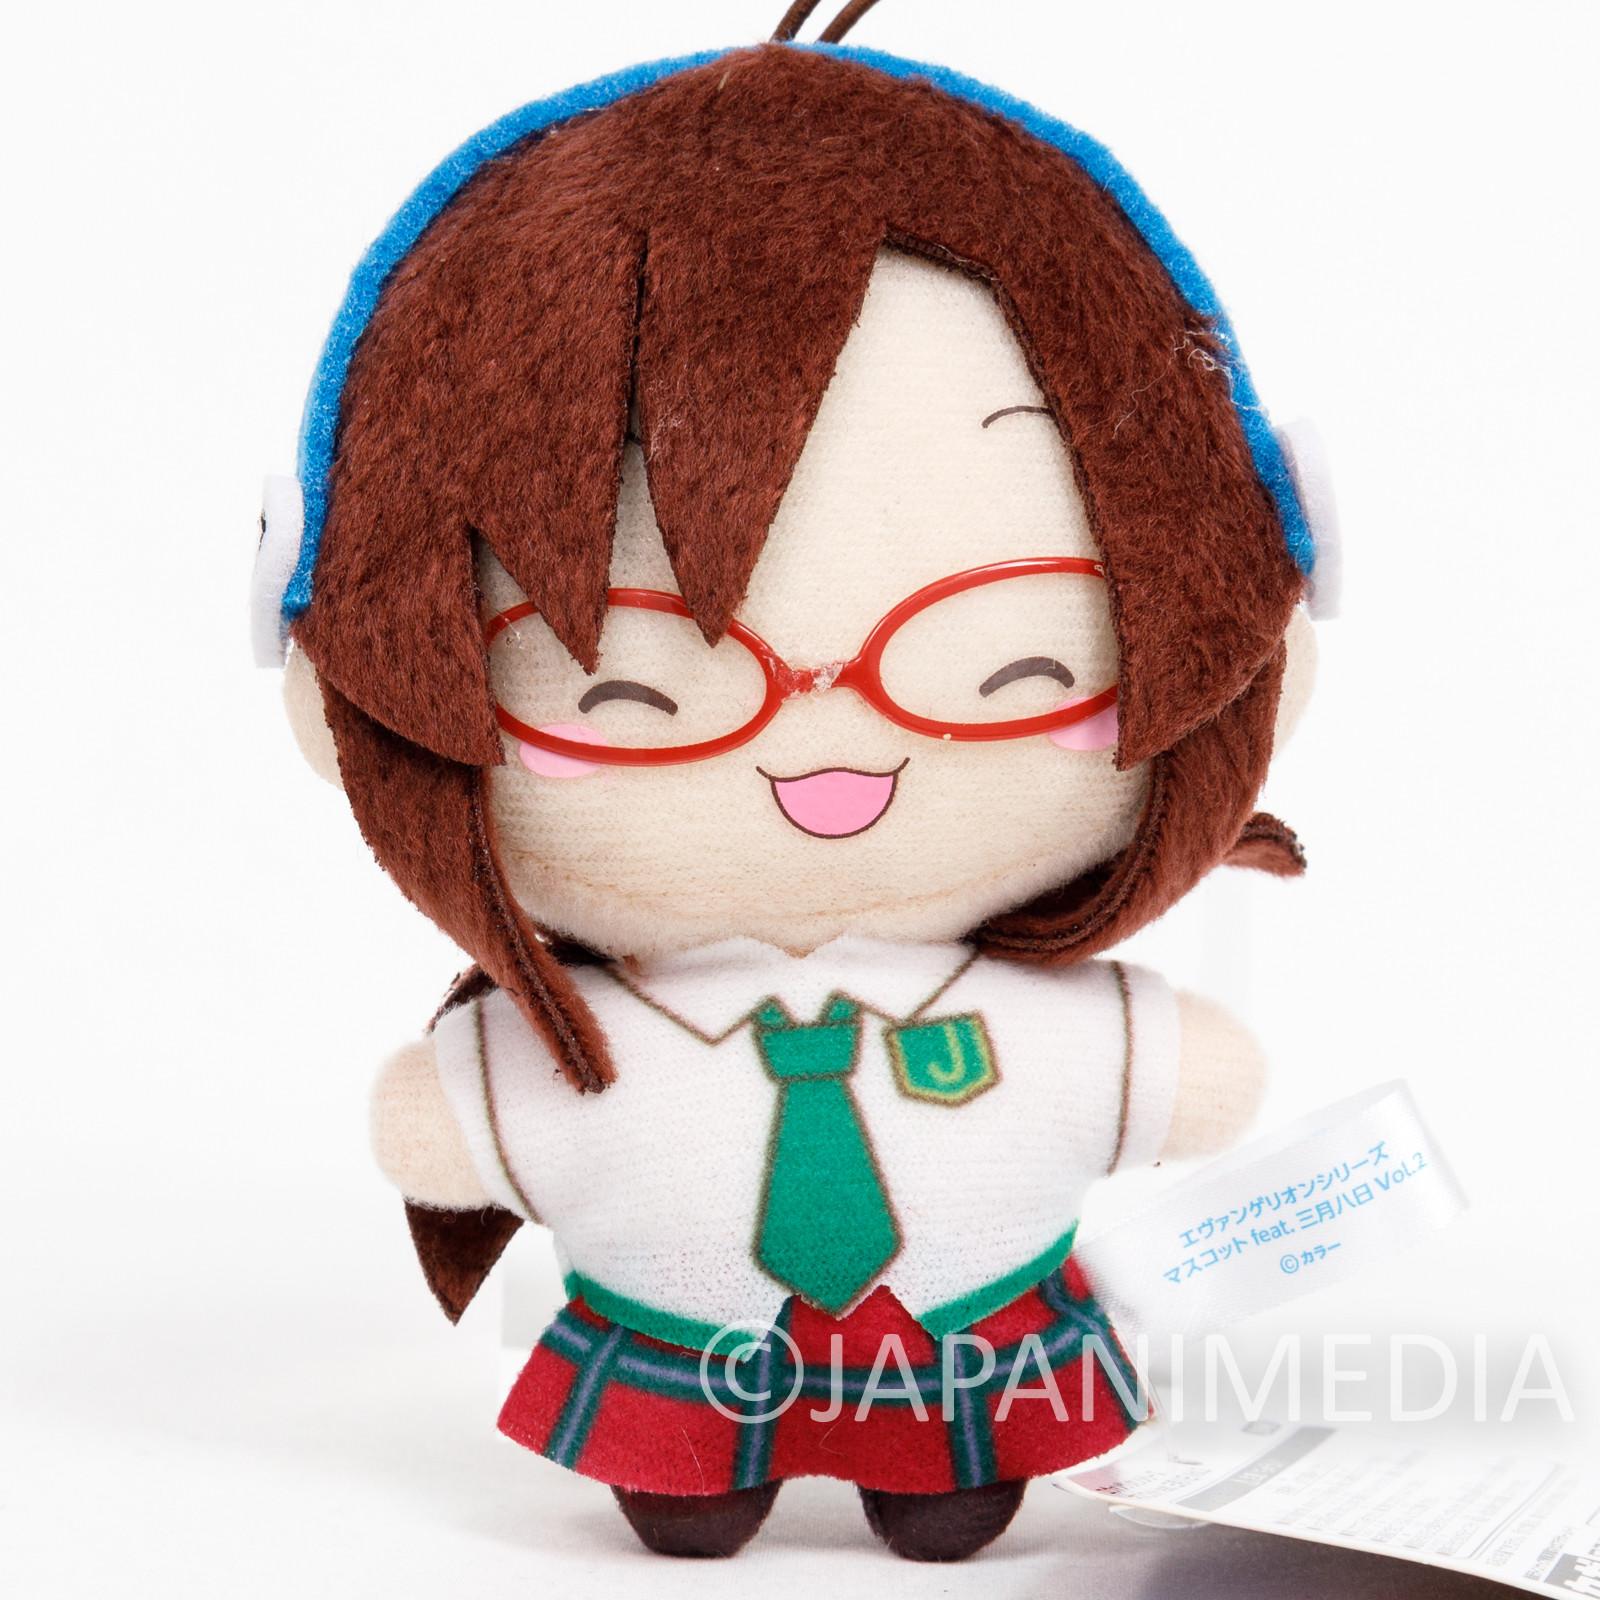 Evangelion Mari Illustrious School Uniform Mini Plush Doll SEGA JAPAN ANIME 2